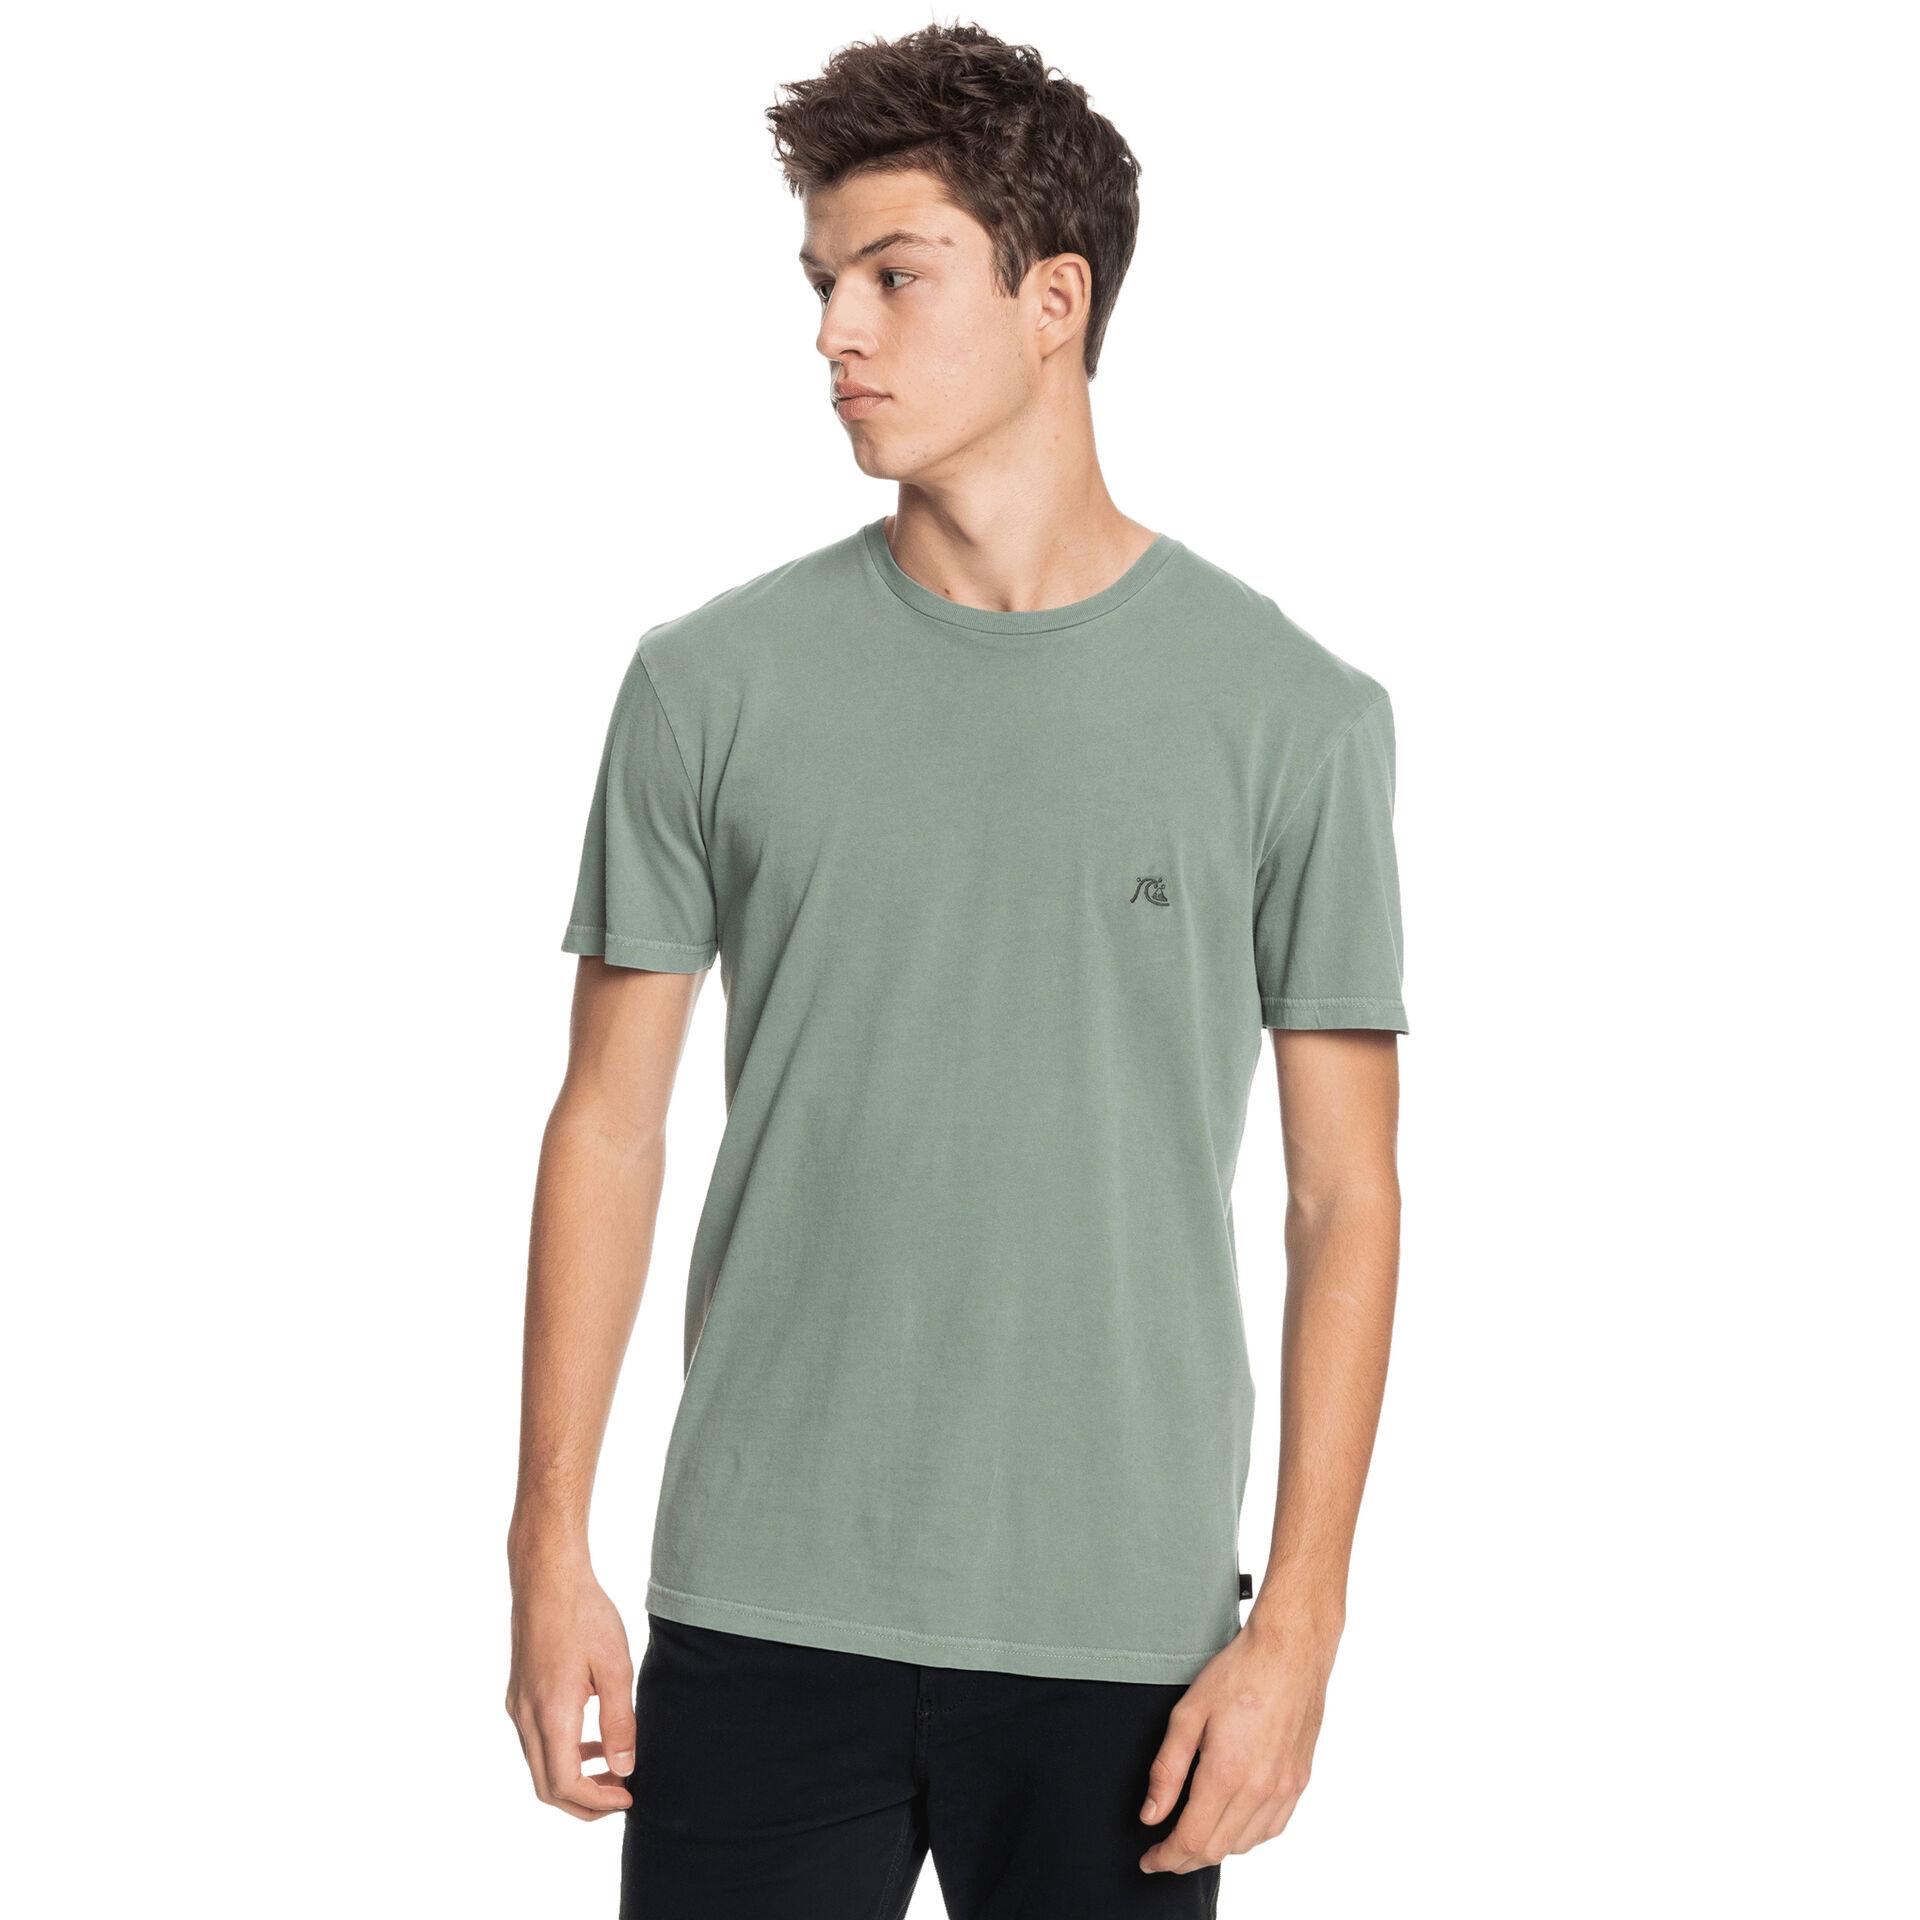 T-Shirt QuikSilver Bubble Emby